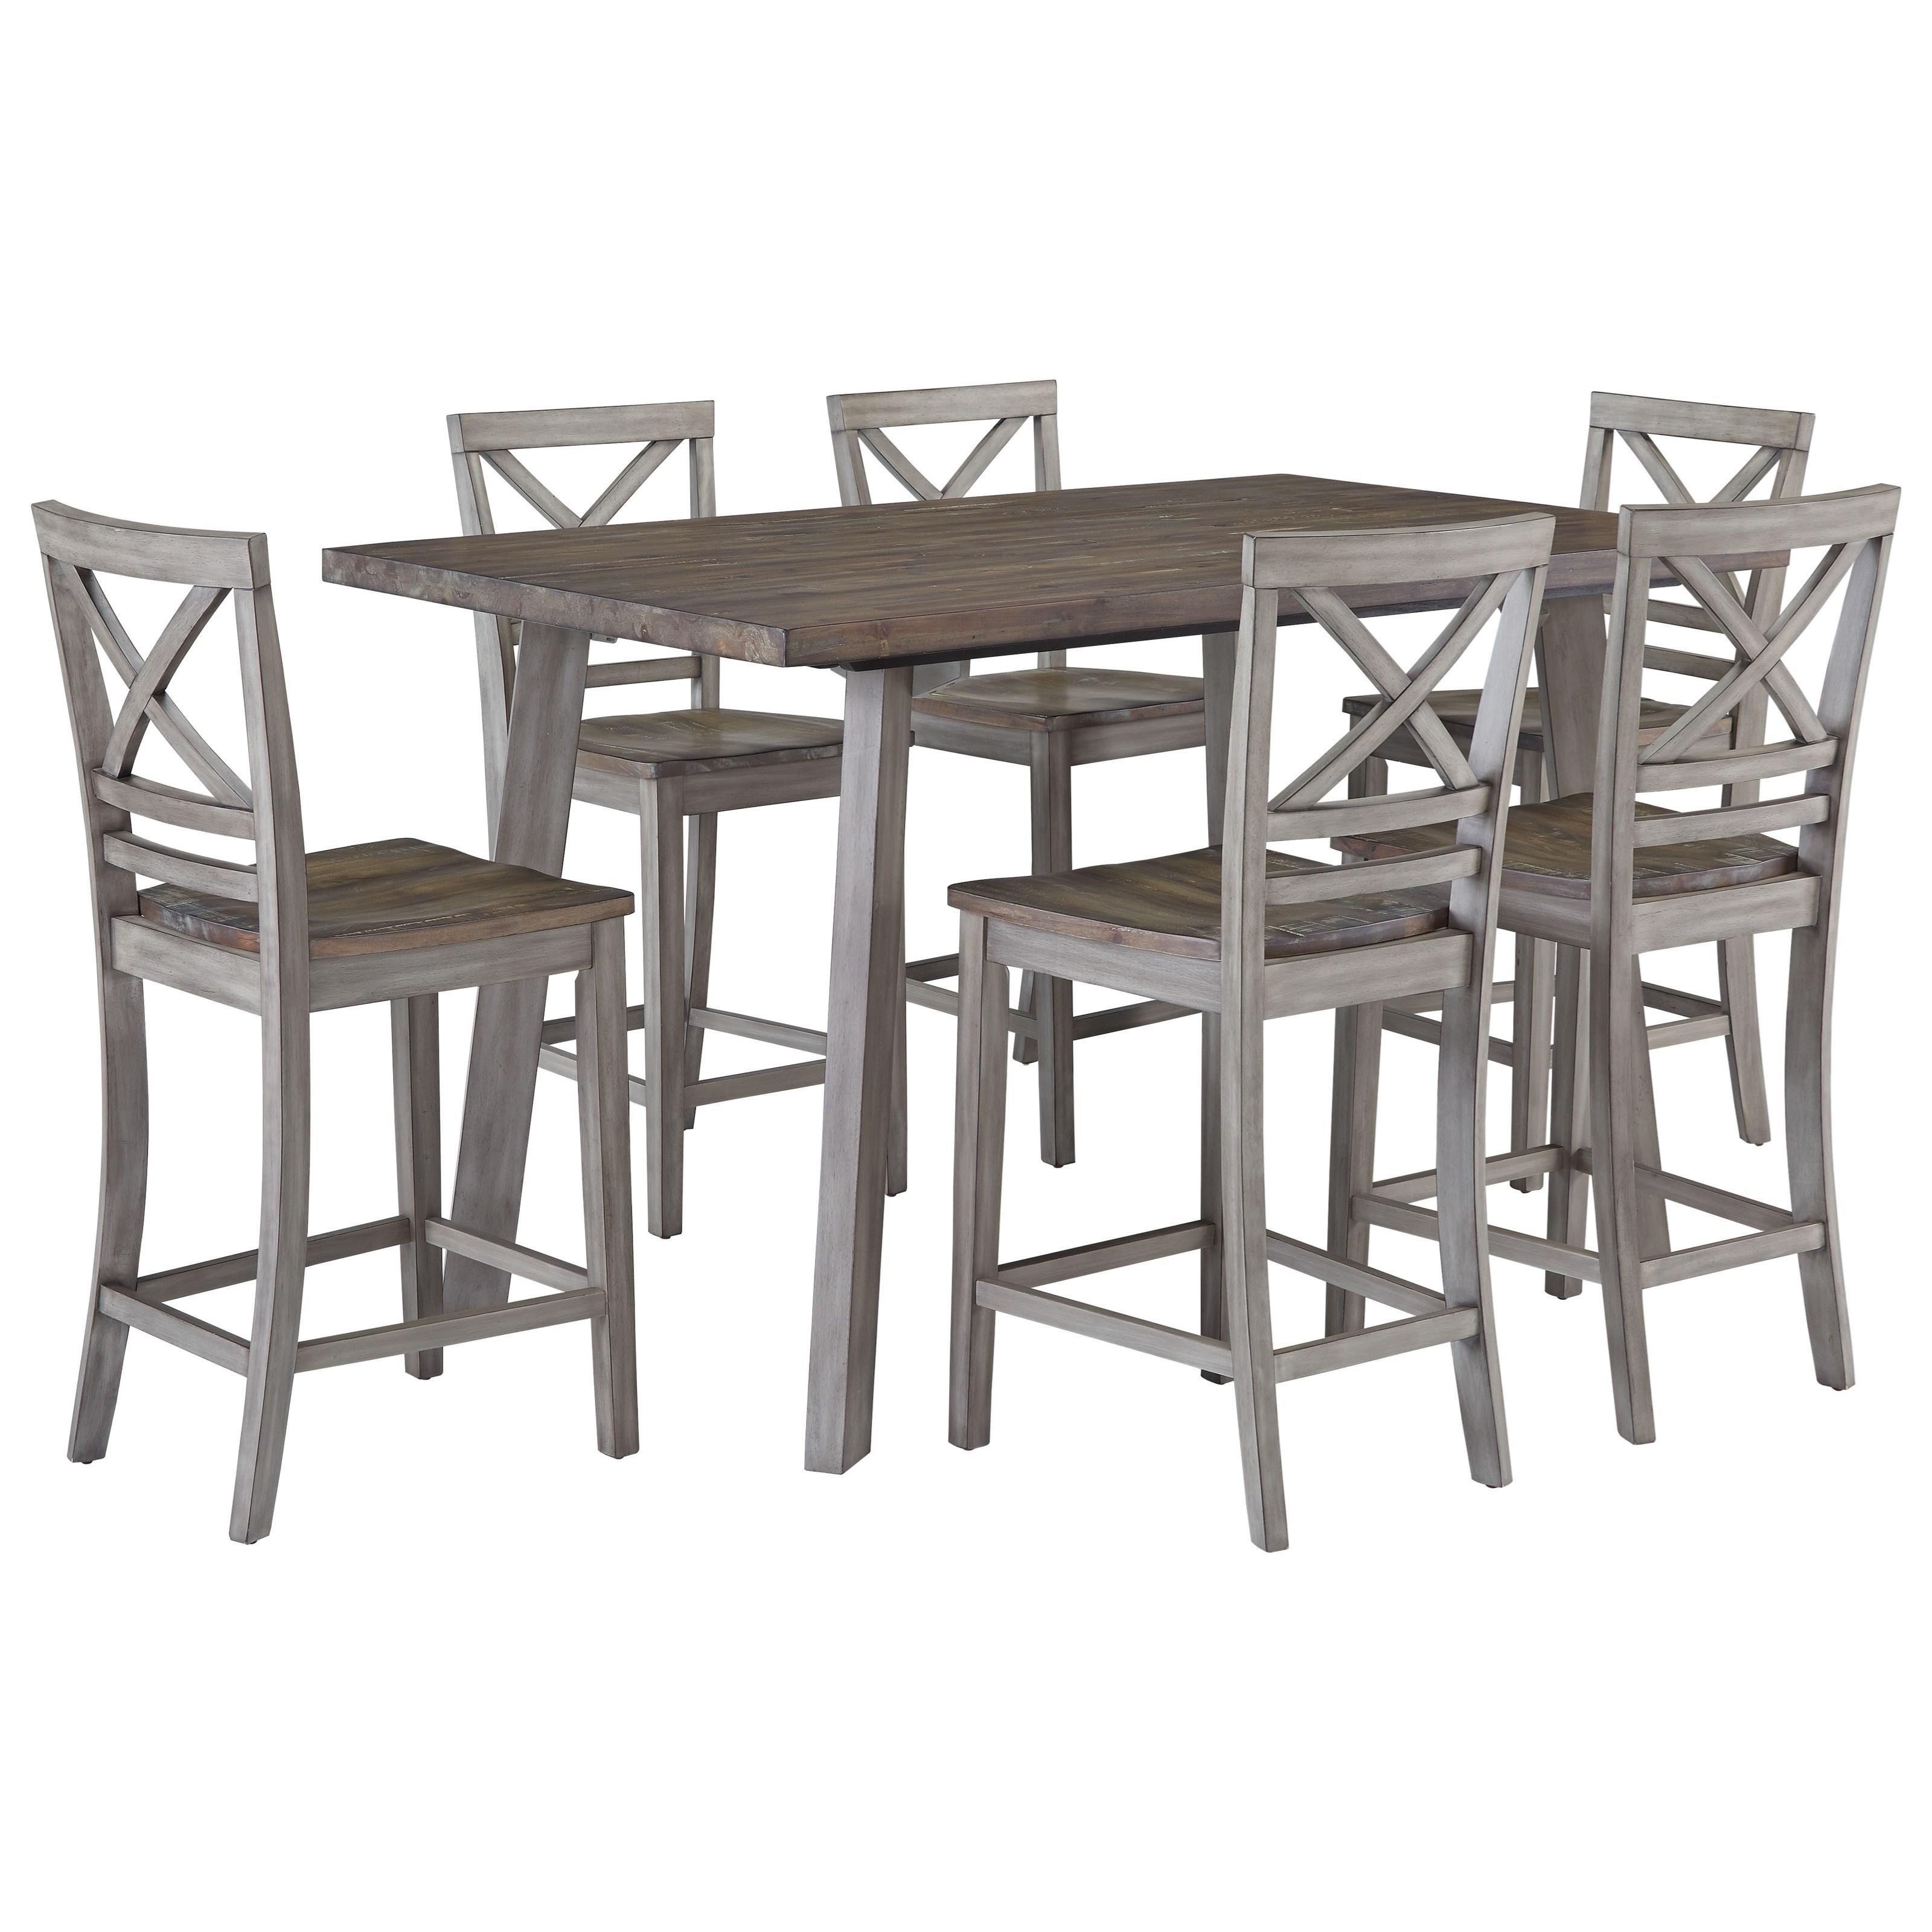 A Kitchen Fairhaven: Standard Furniture Fairhaven Rustic Counter Height